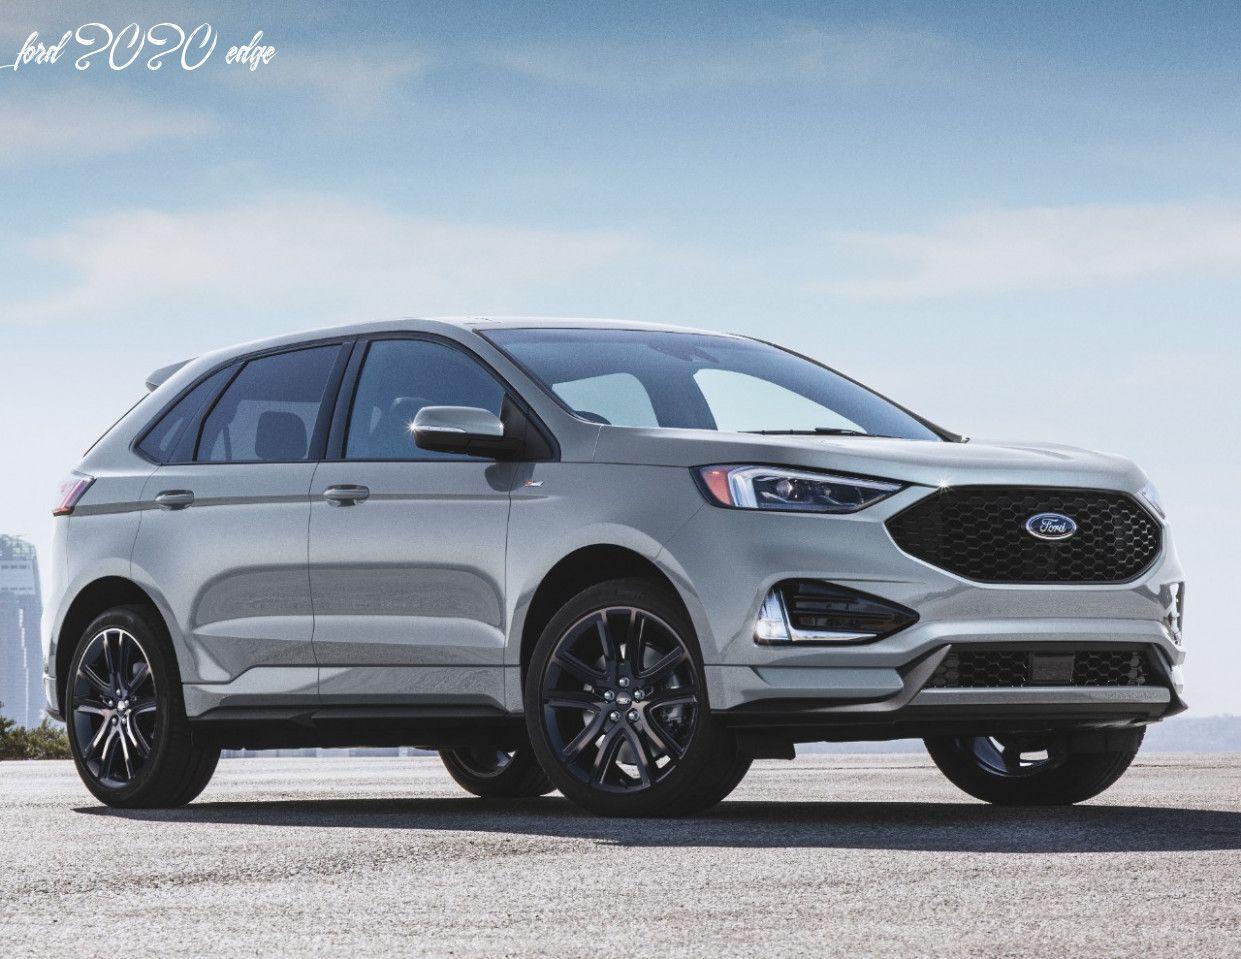 Ford 2020 Edge In 2020 Ford Edge Sport Ford Edge Ford 2020